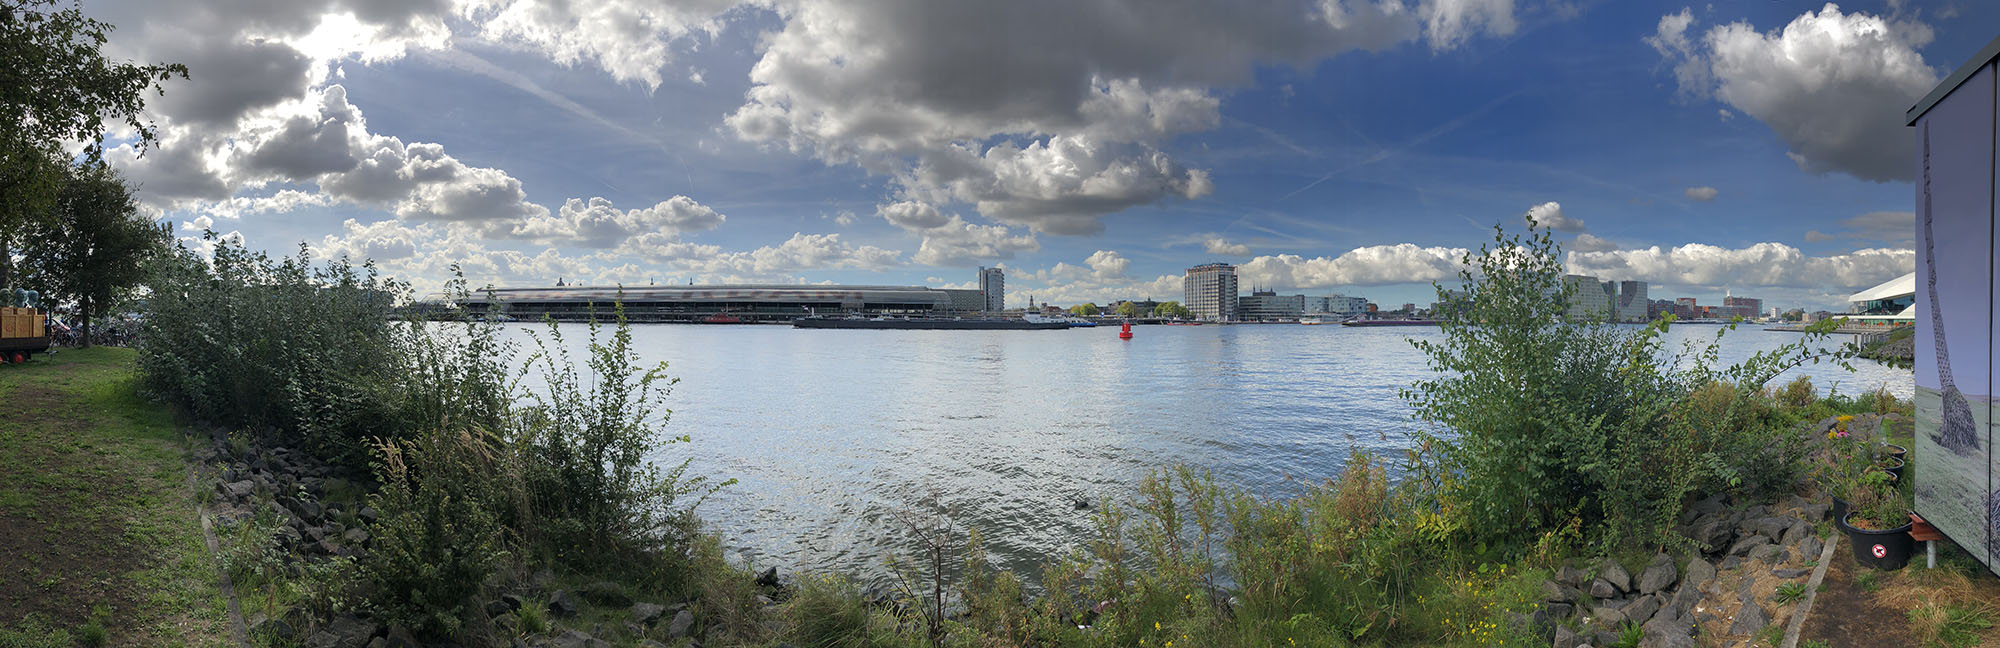 Panorama, foto gemaakt met iPhone XS Max